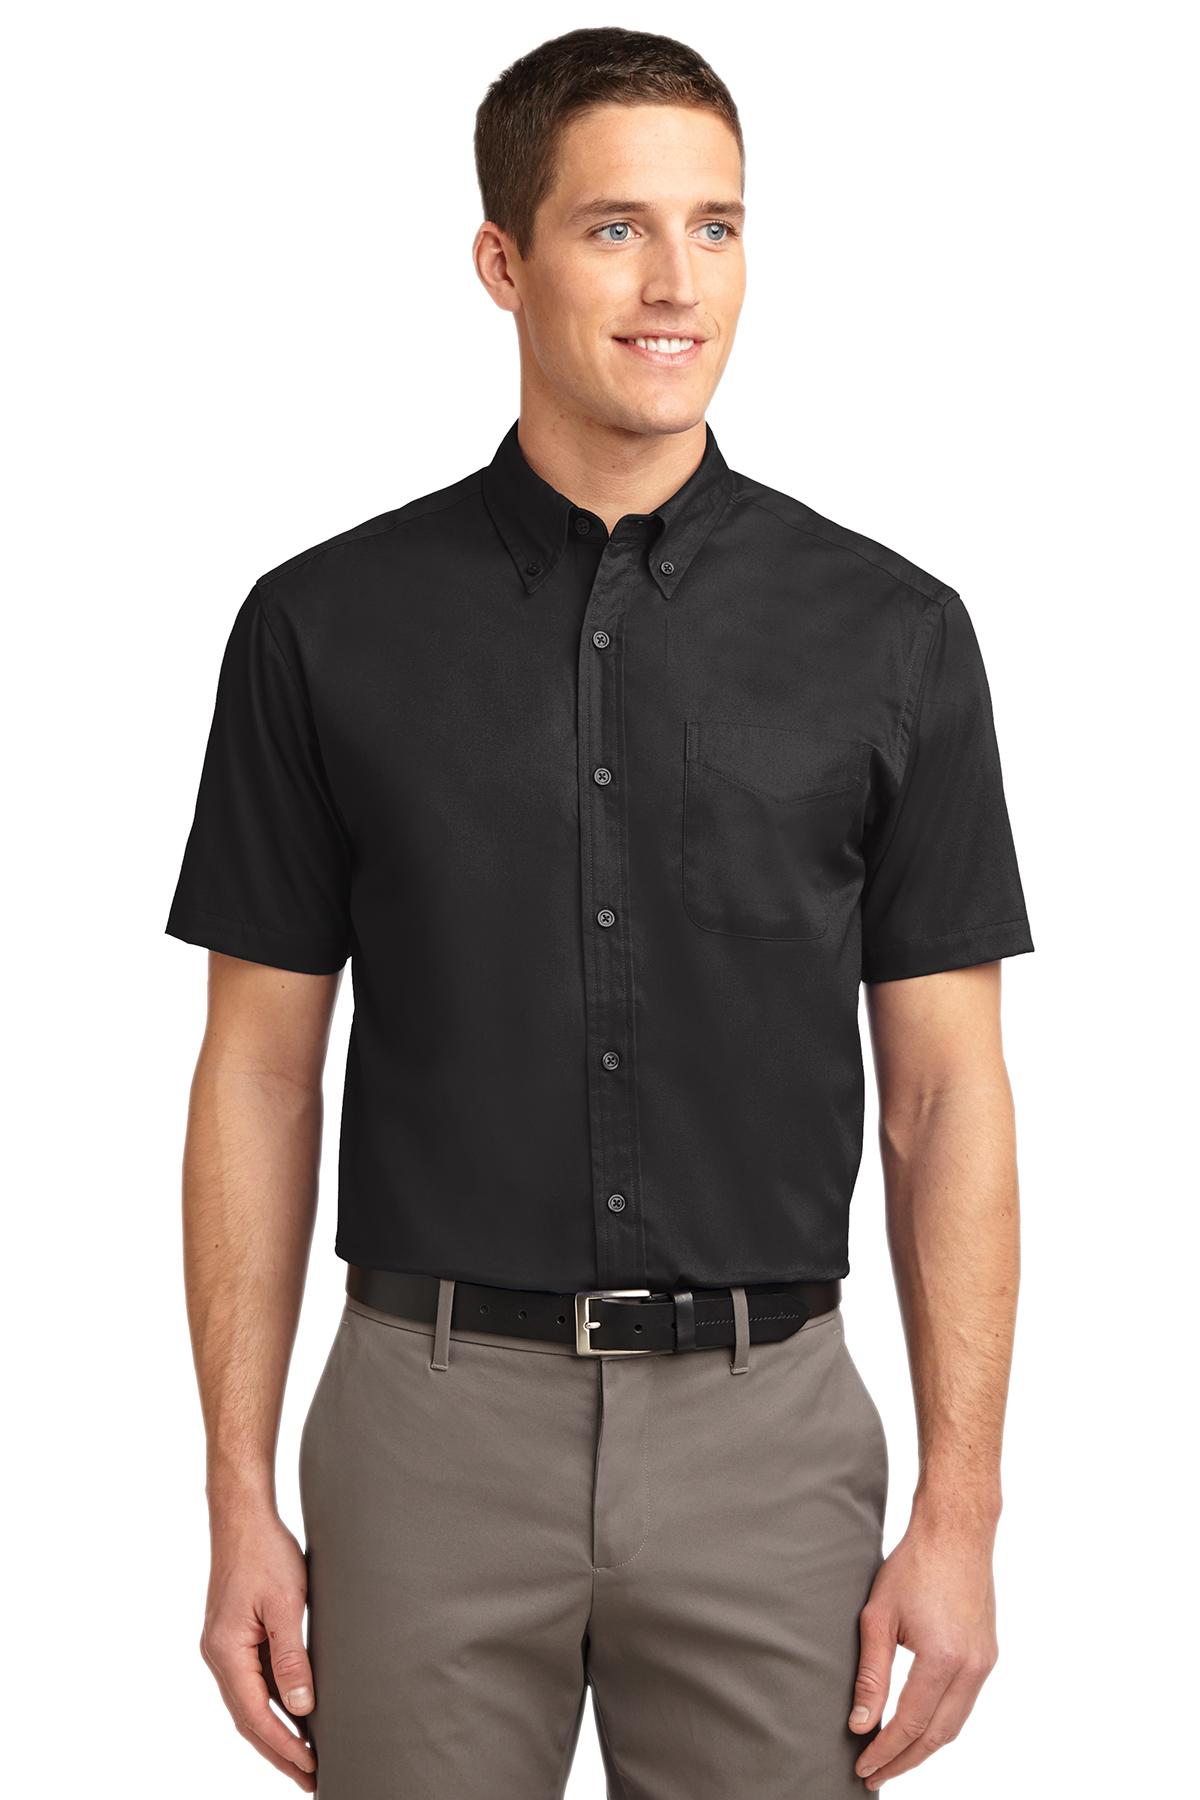 White//Lt Stone Port Authority Short Sleeve Easy Care Shirt